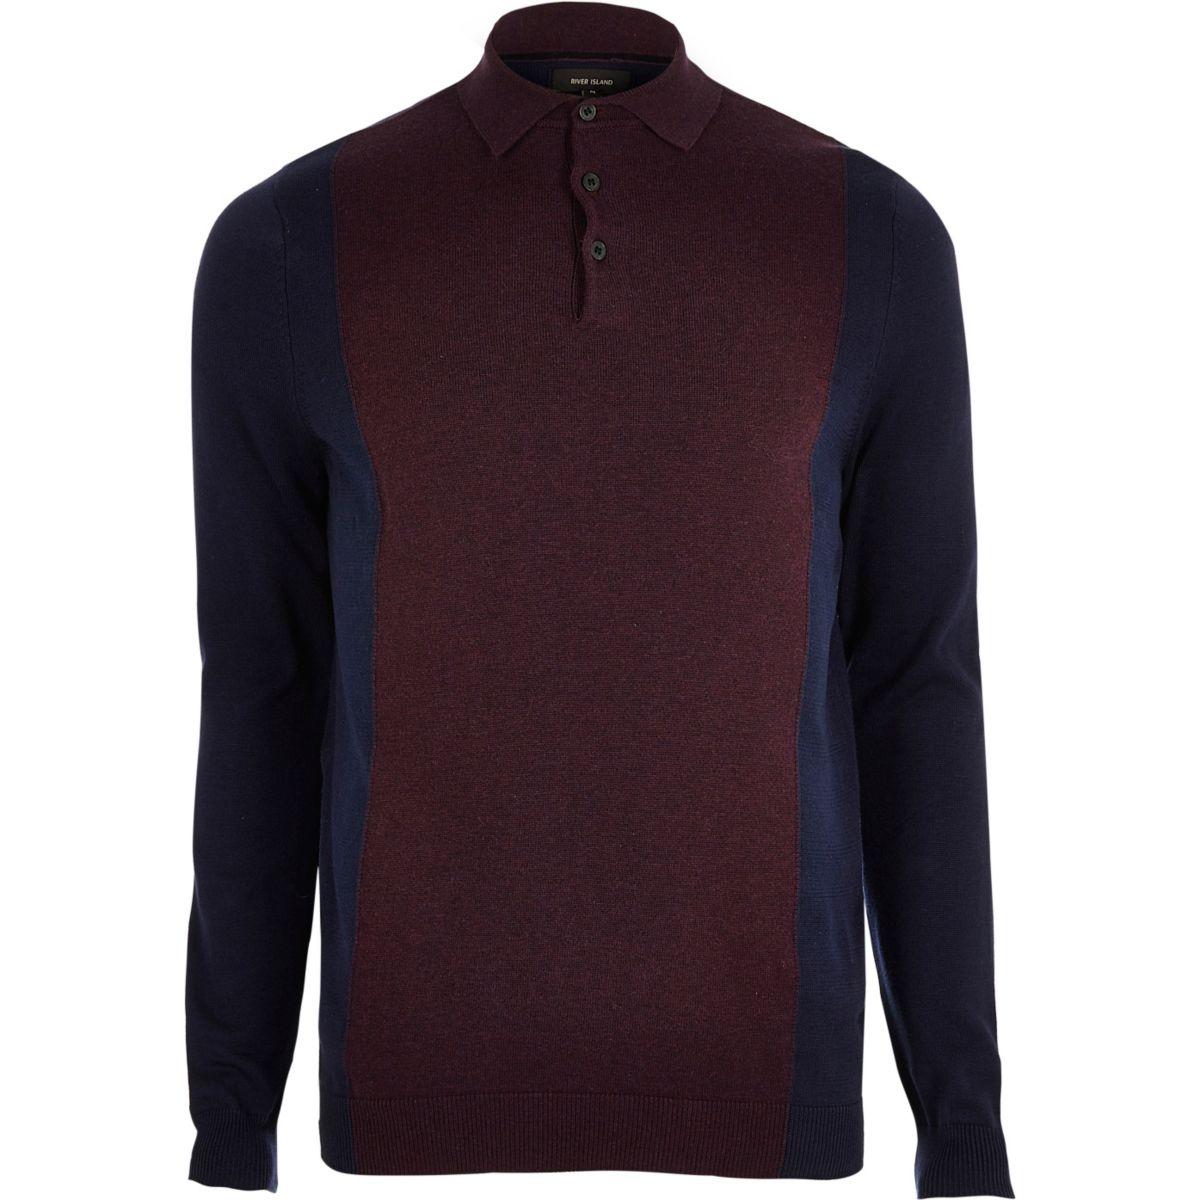 Purple knit color block polo shirt